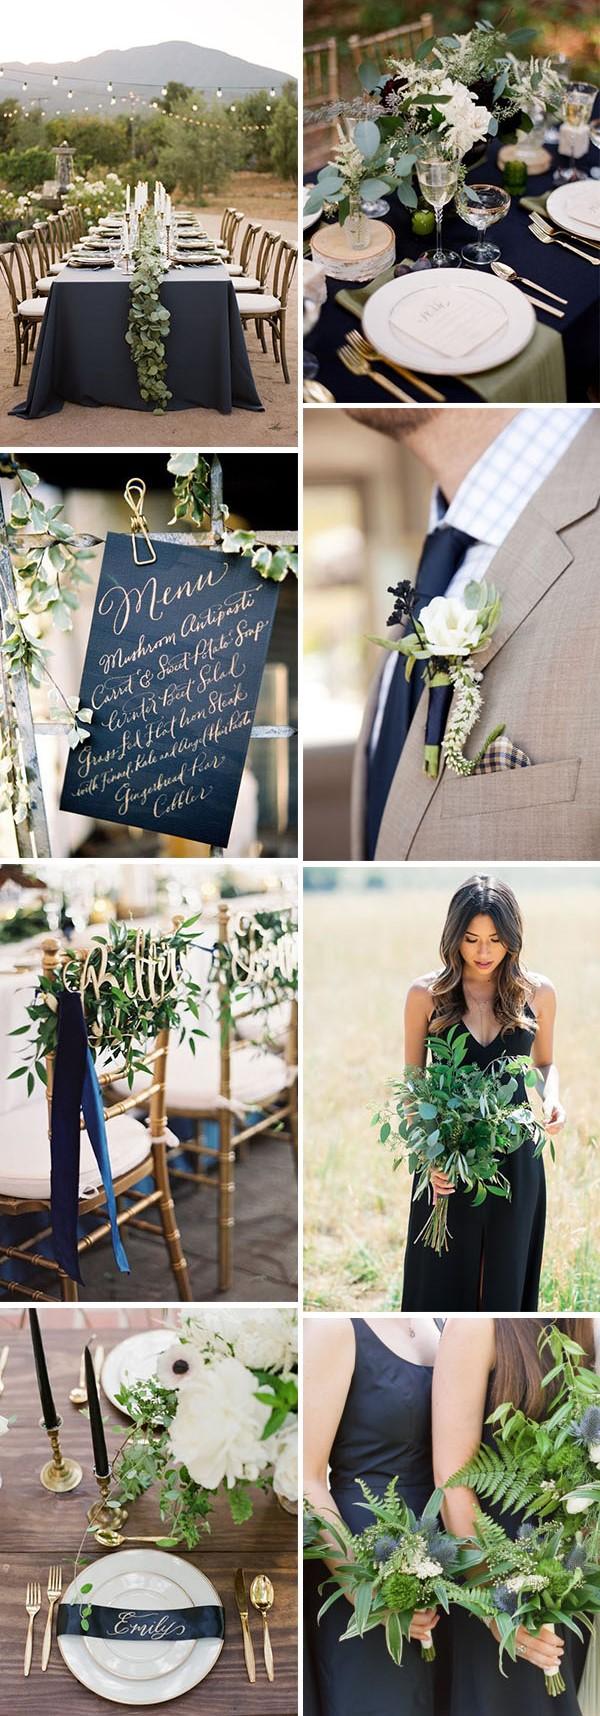 dark-navy-and-greeenery-classic-wedding-colors-2.jpg